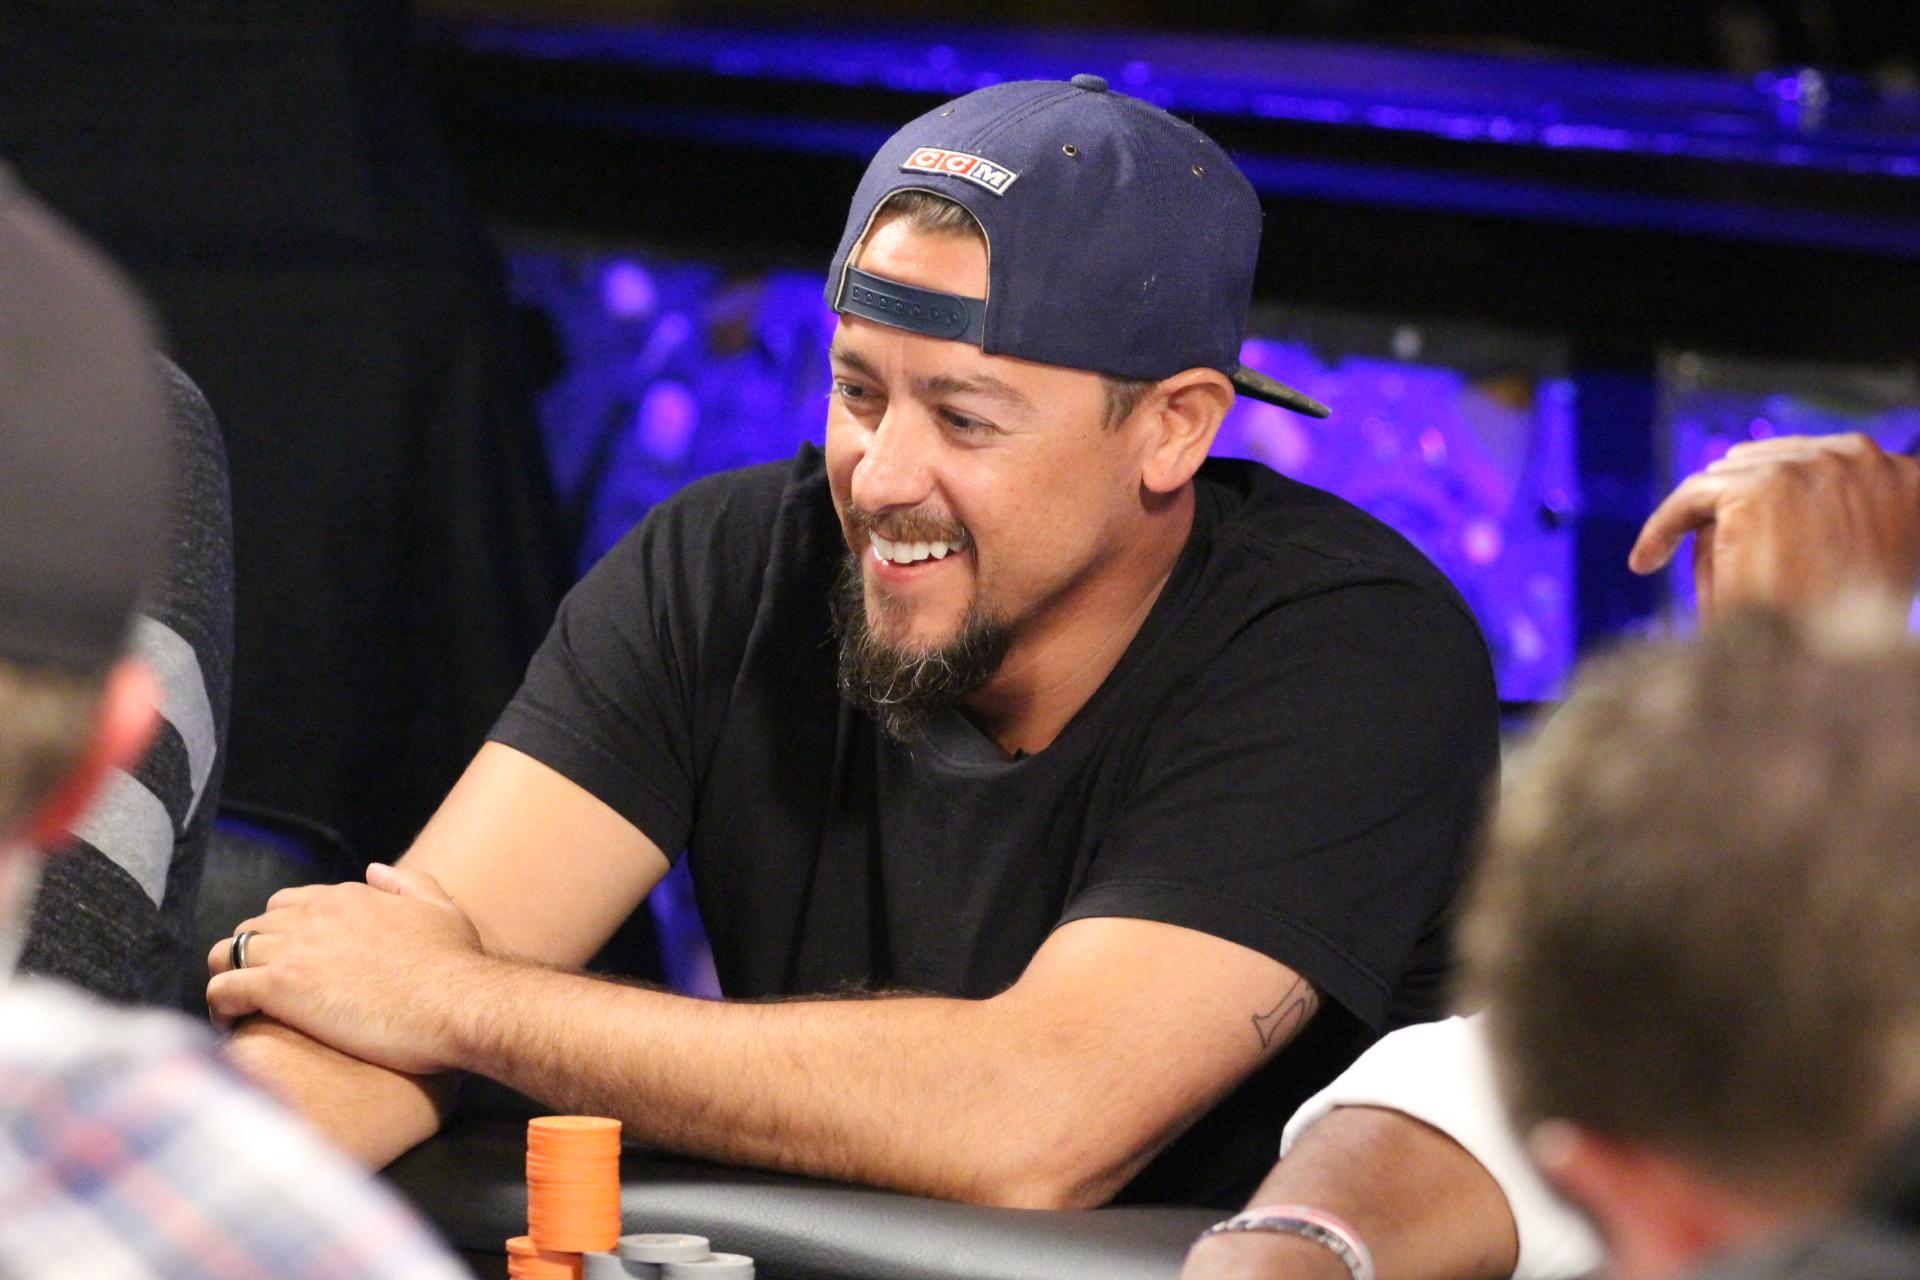 Heartland Poker Tour